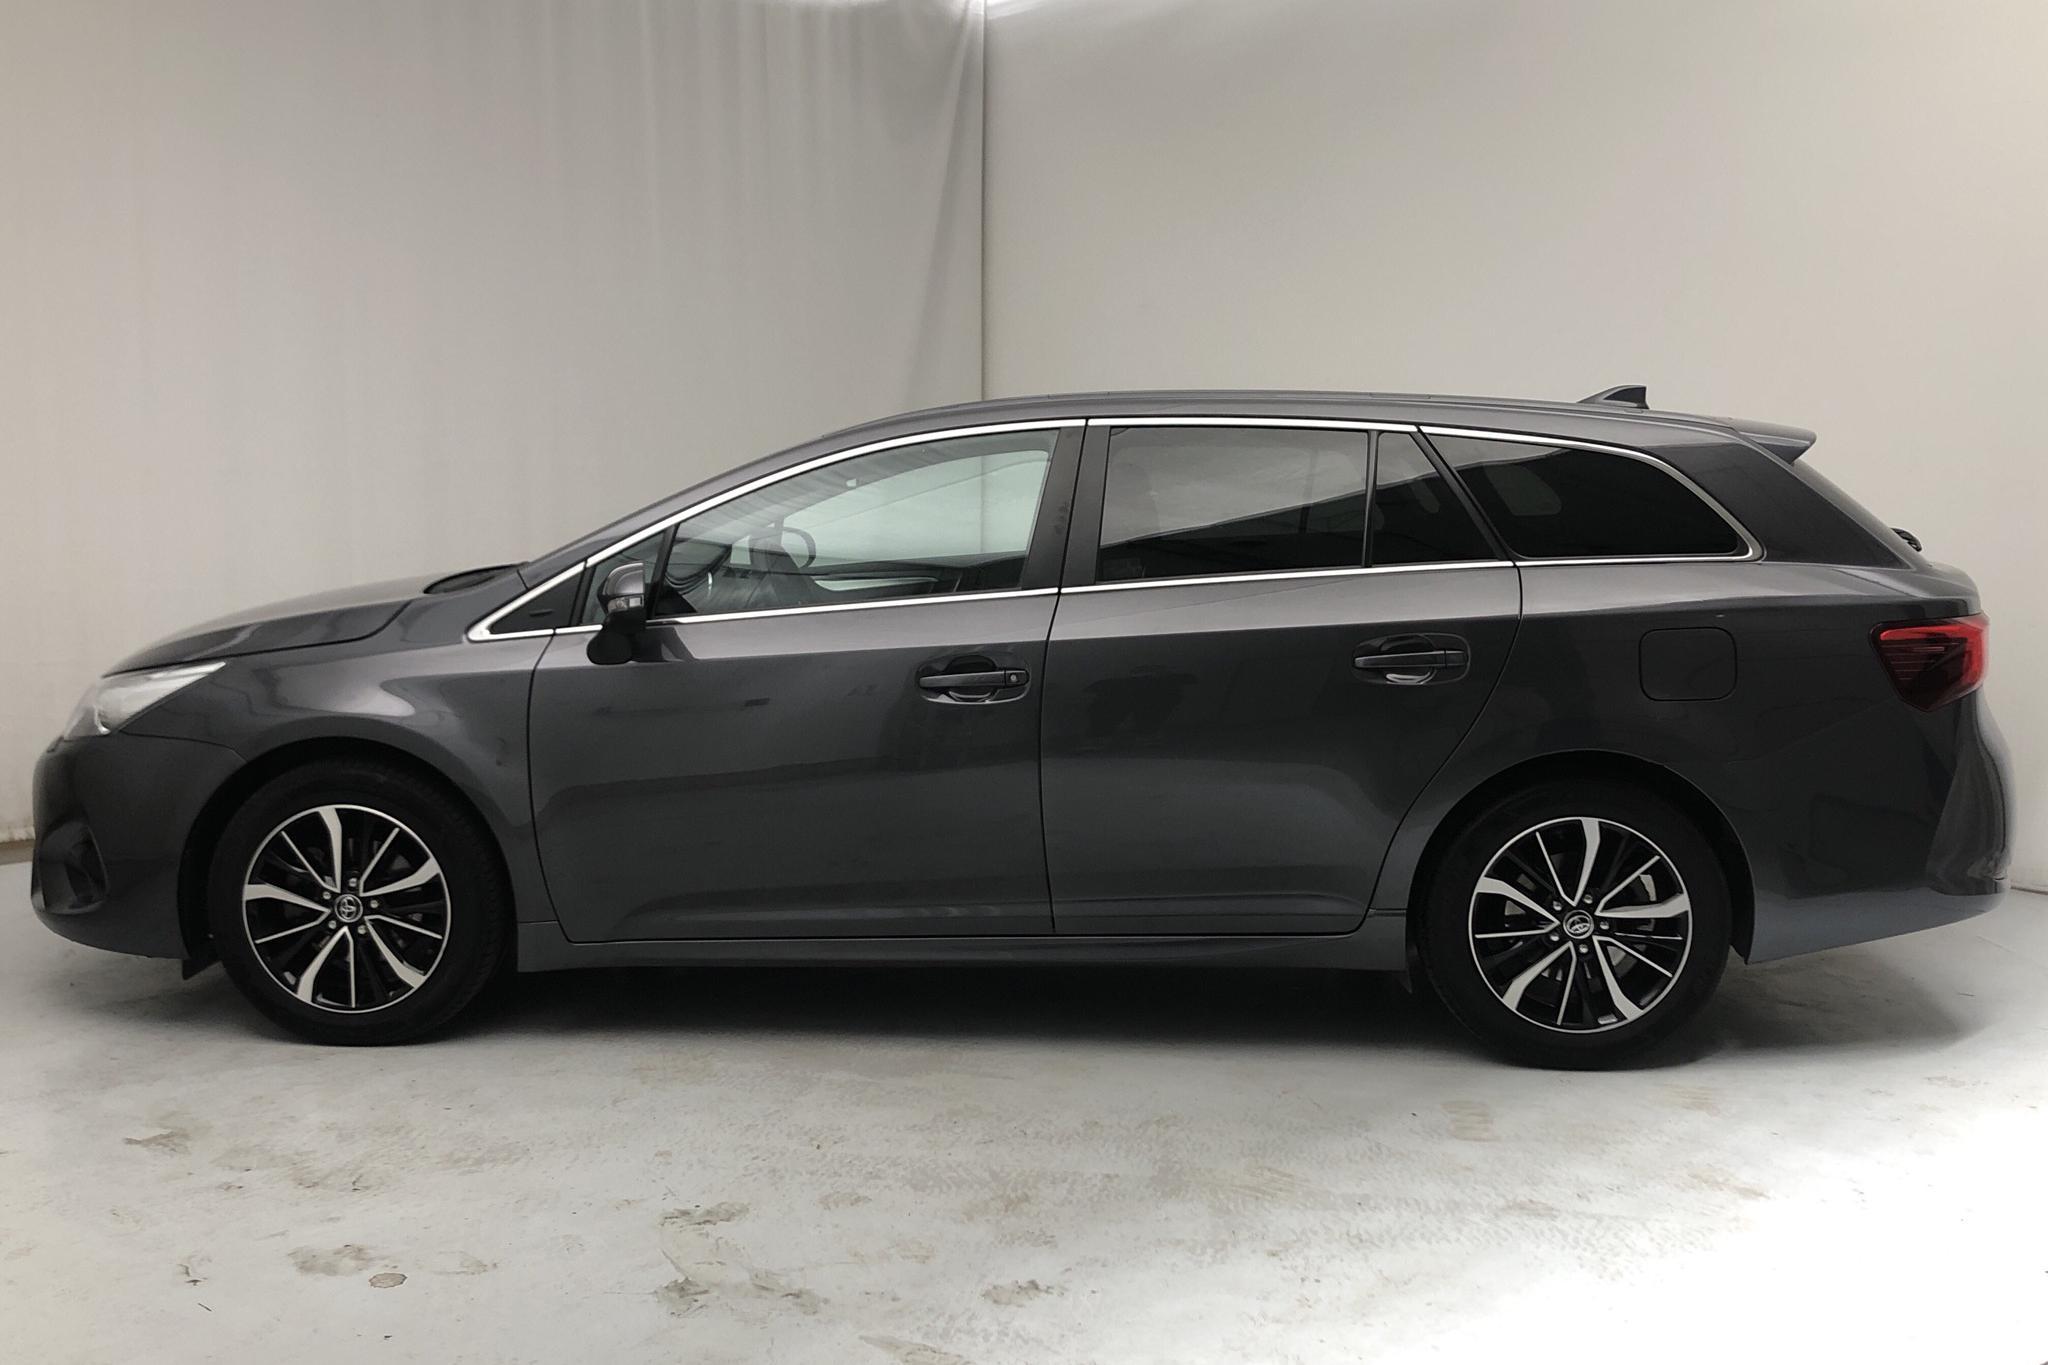 Toyota Avensis 1.8 Touring Sports (147hk) - 1 860 mil - Manuell - Dark Grey - 2018